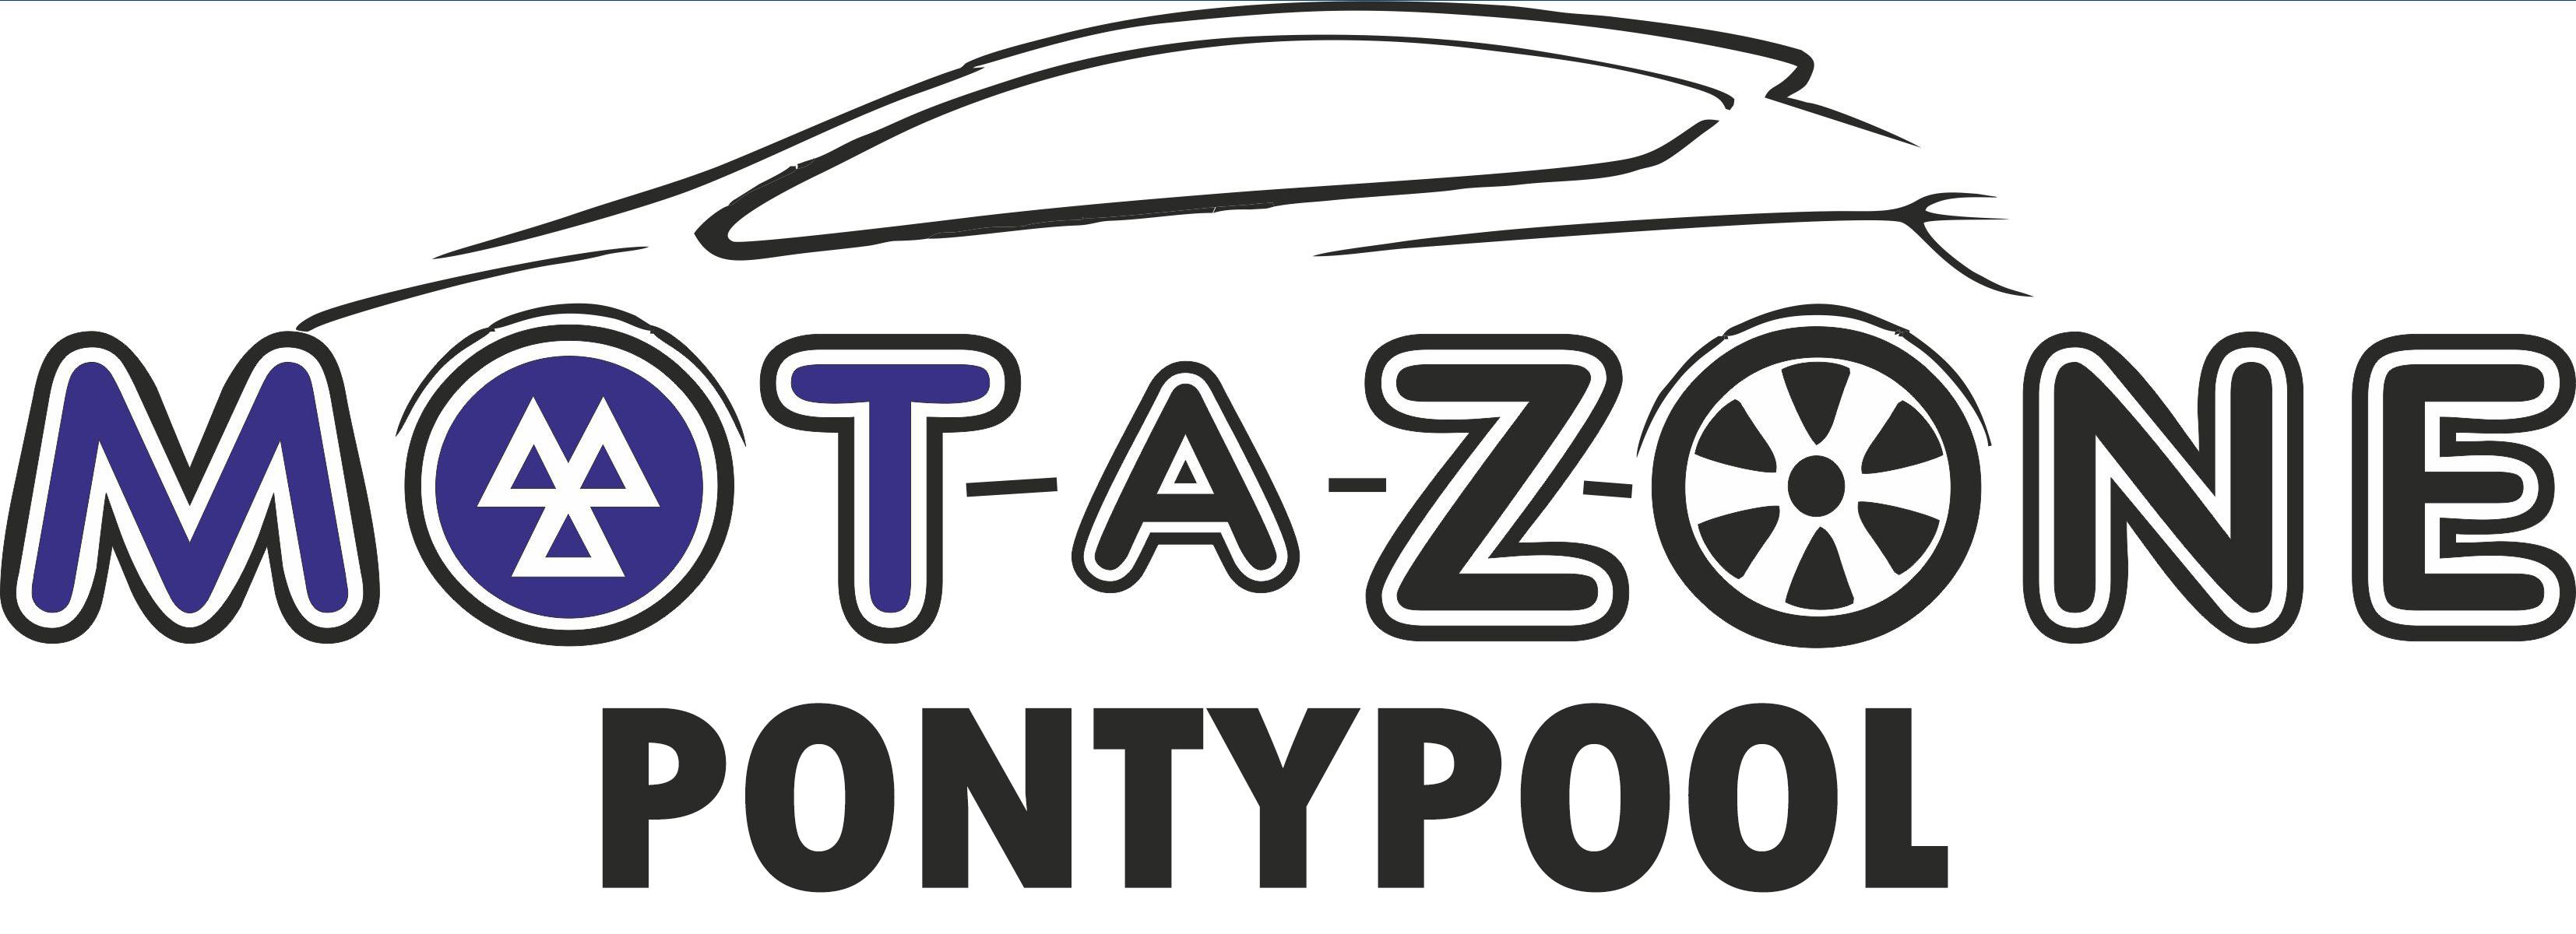 Panteg Service Station Logo